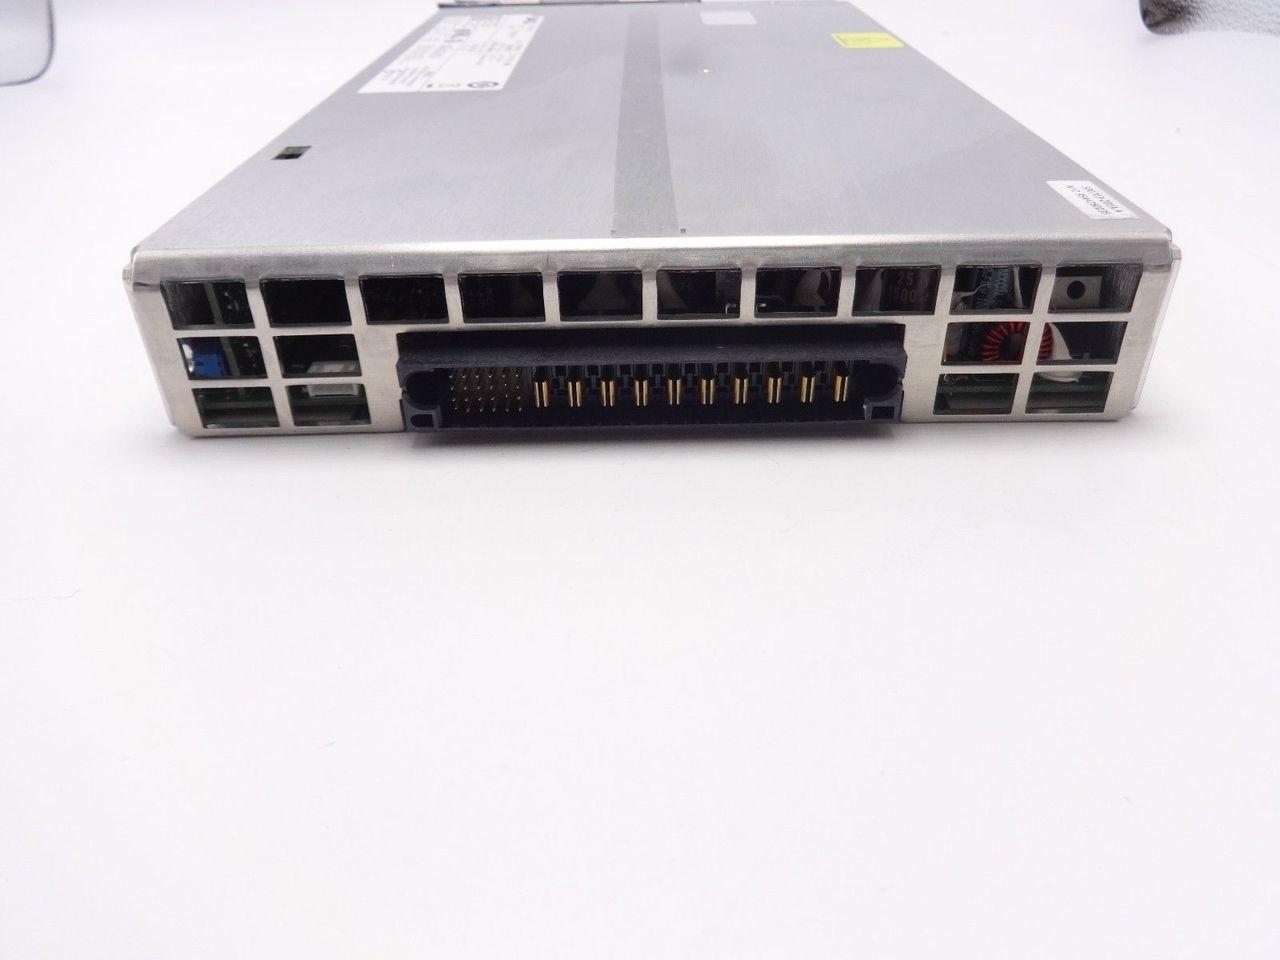 DELL JN640 POWEREDGE R905 1100W POWER SUPPLY